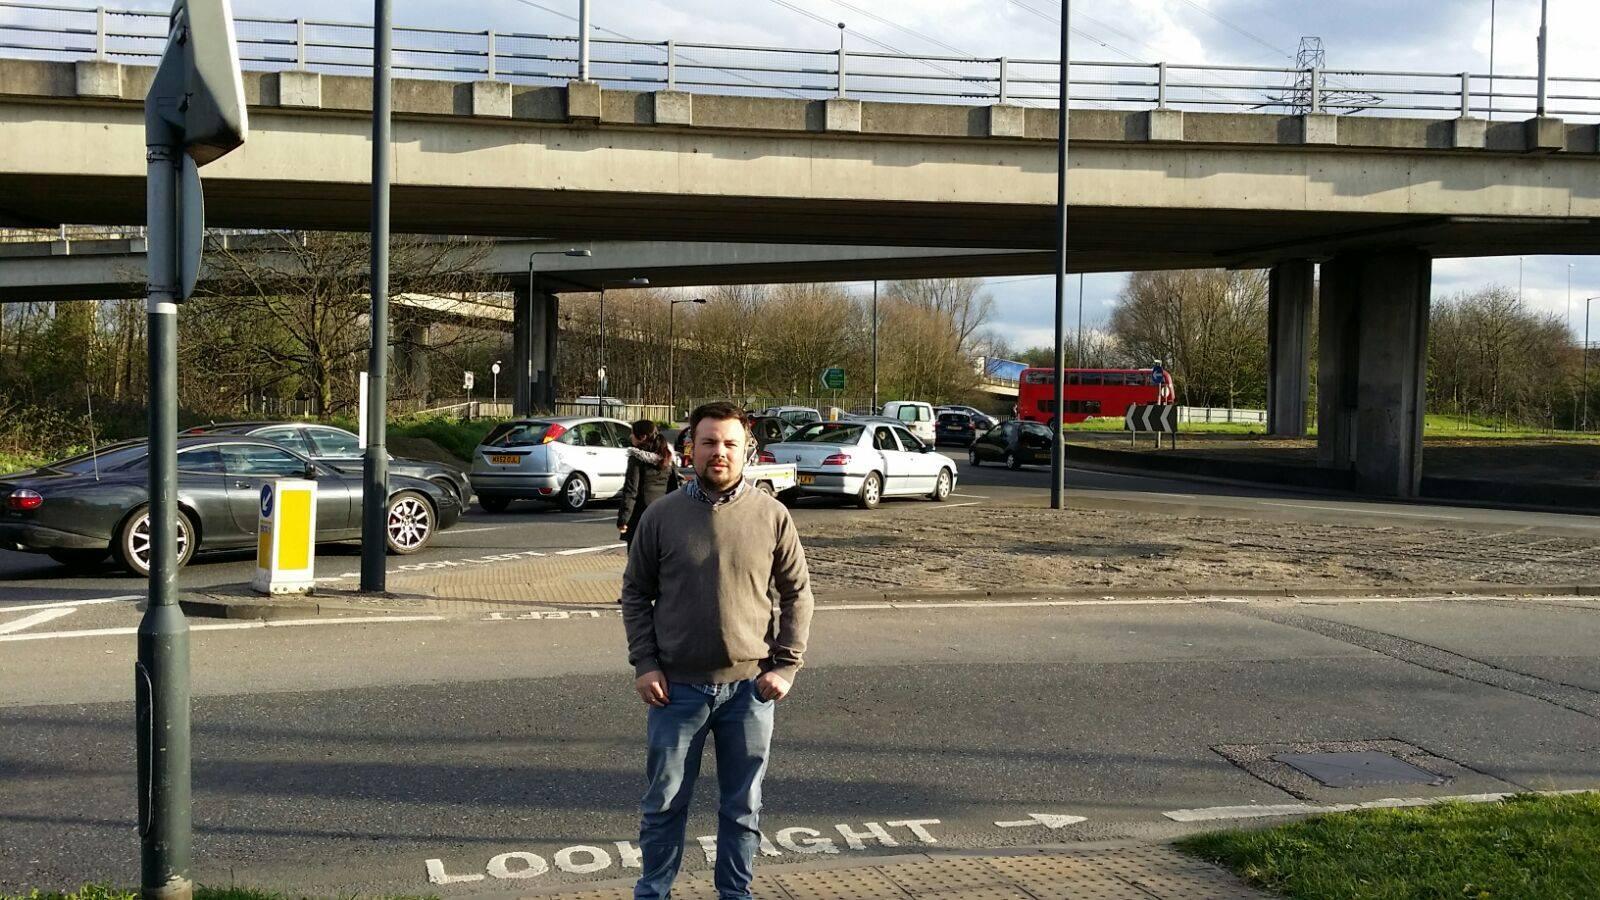 Cllr Duddridge at Charlie Brown's Roundabout